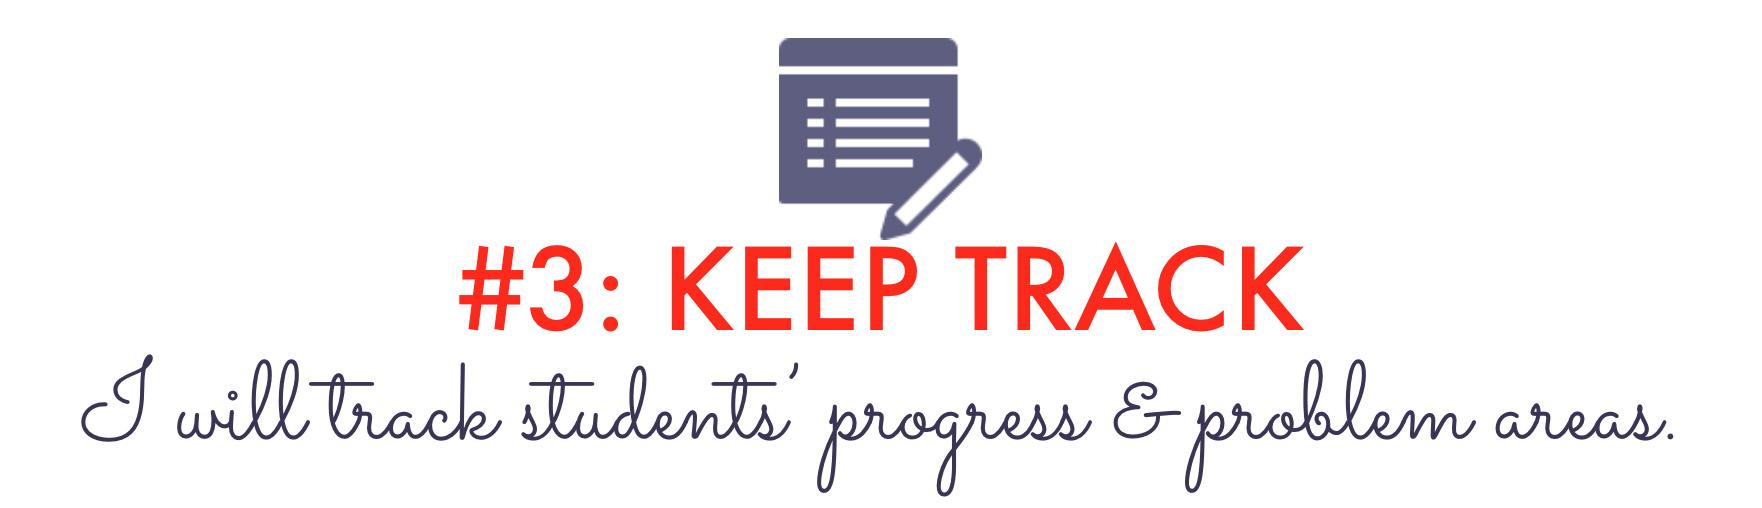 TEFL-Resolutions-3-Keep-track.jpg